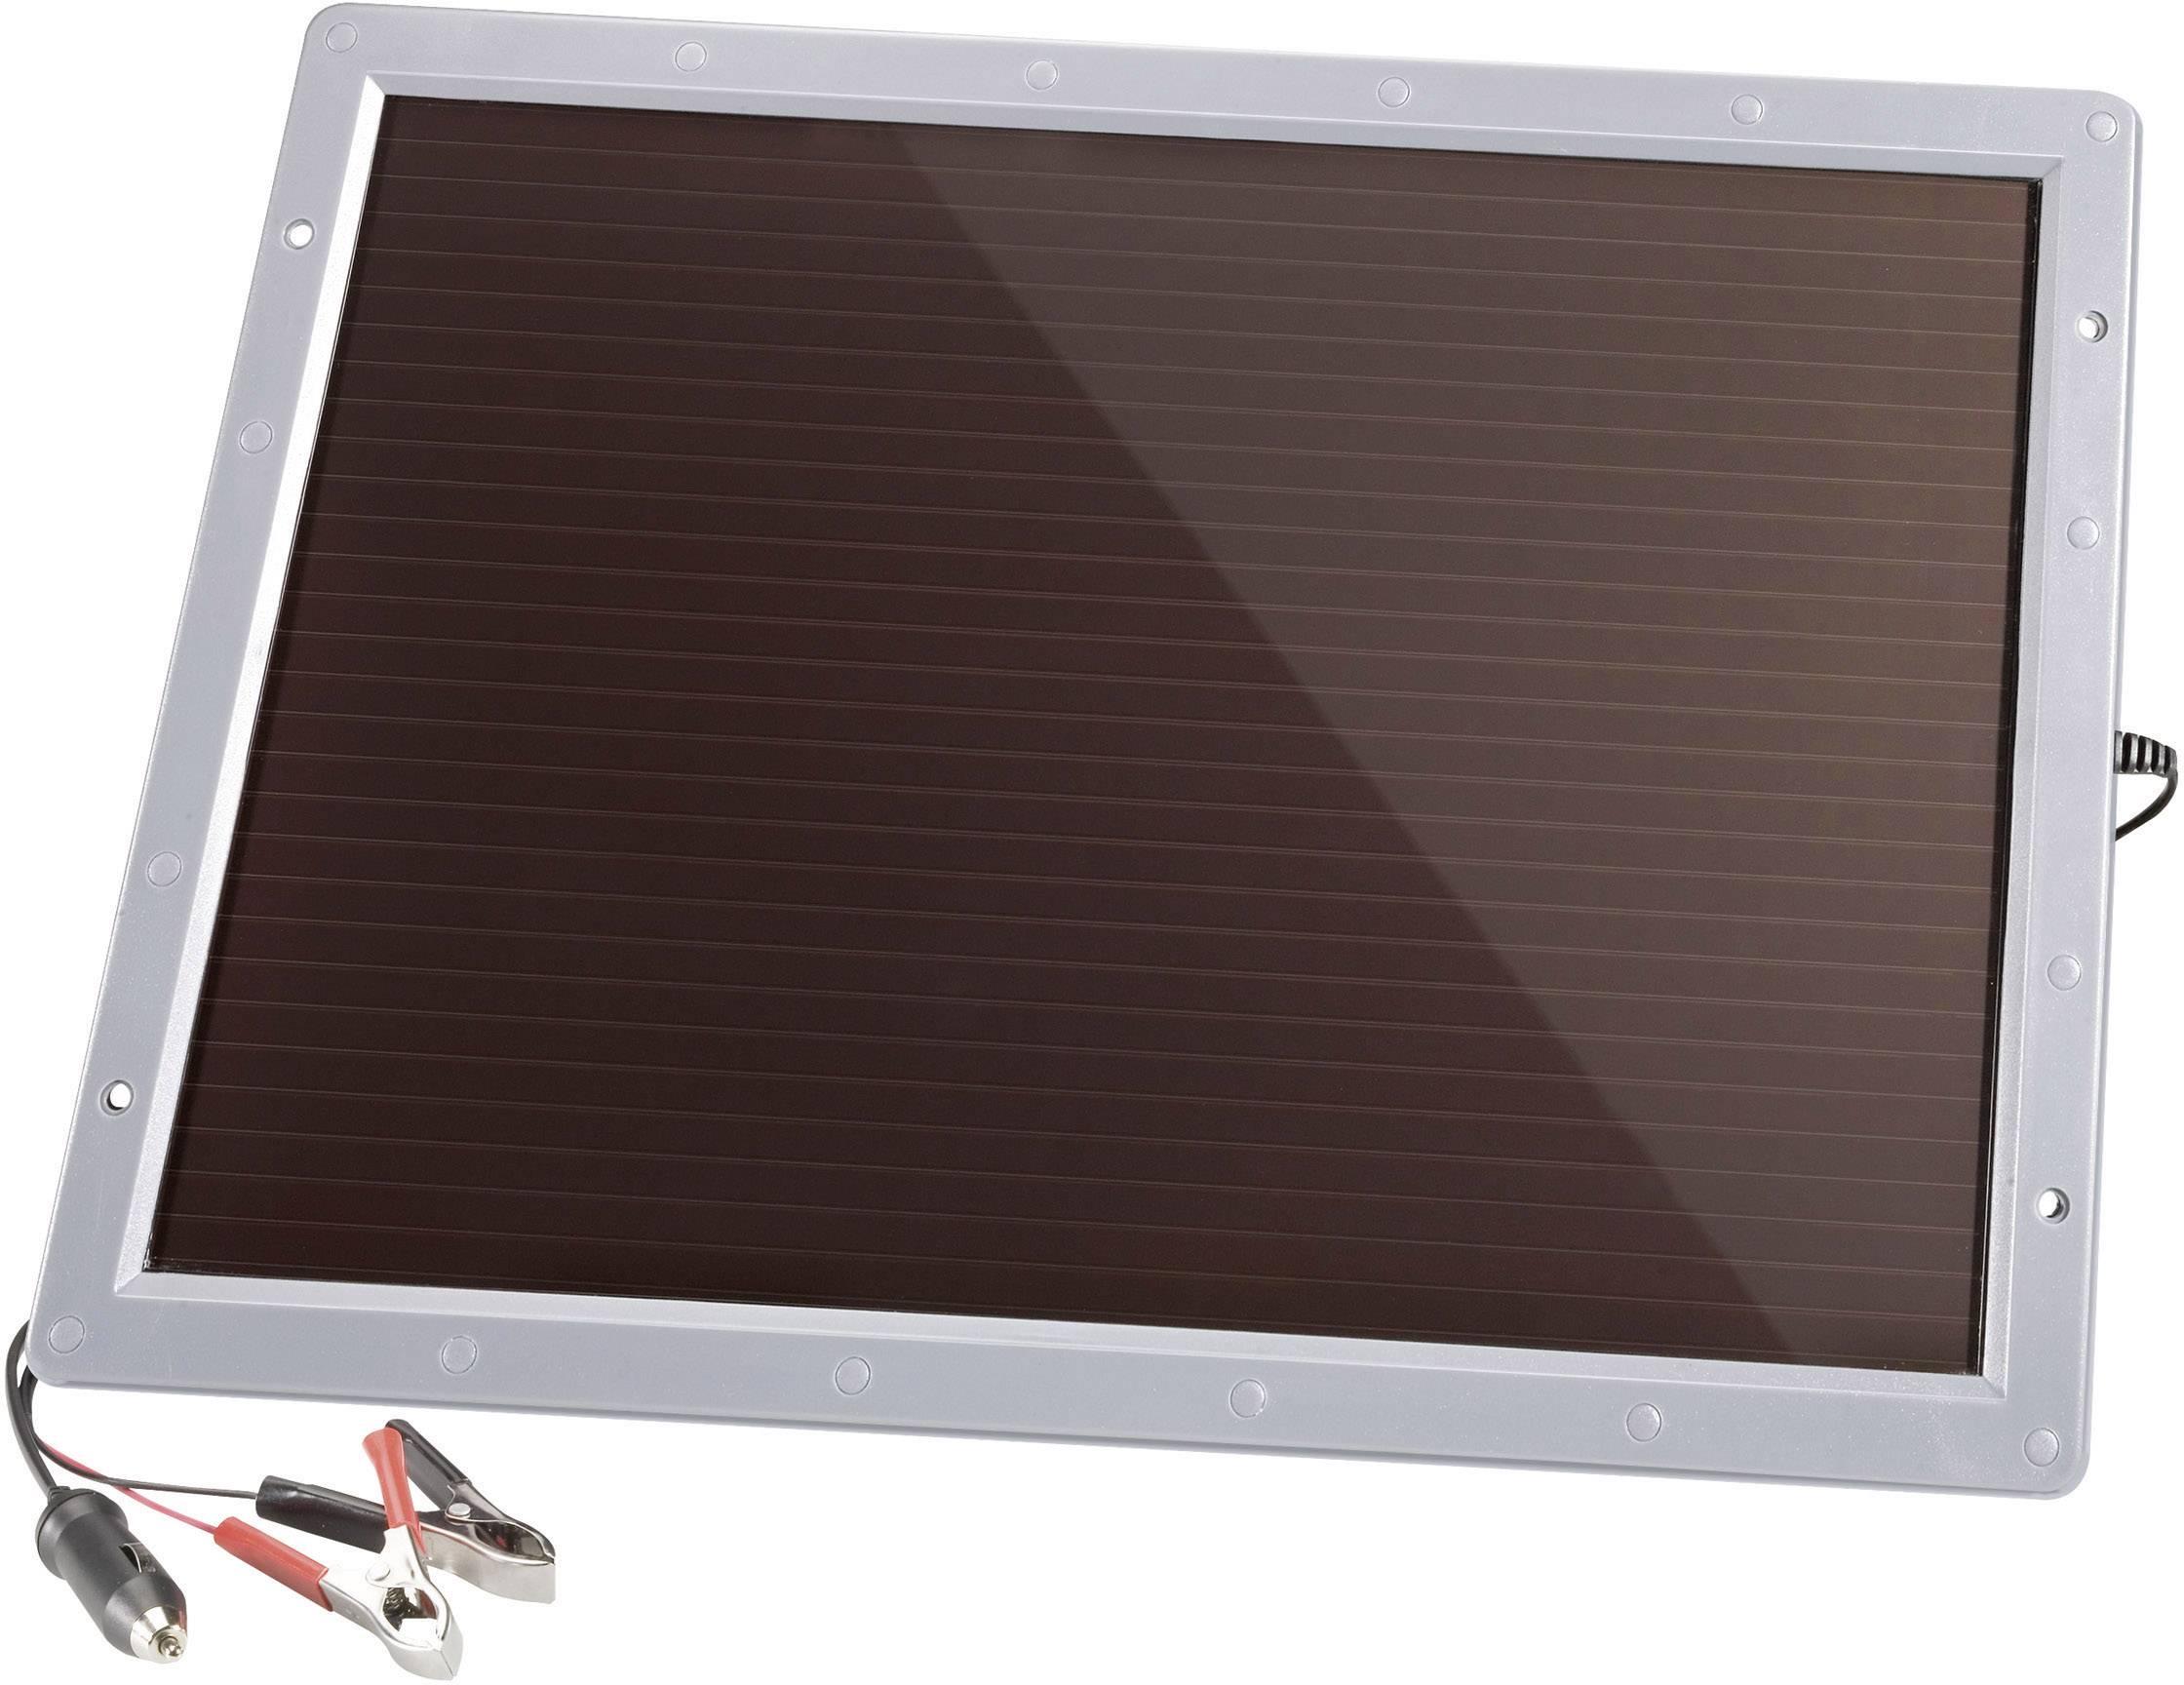 Solárna nabíjačka autobatérií TPS-102-6, 6 W